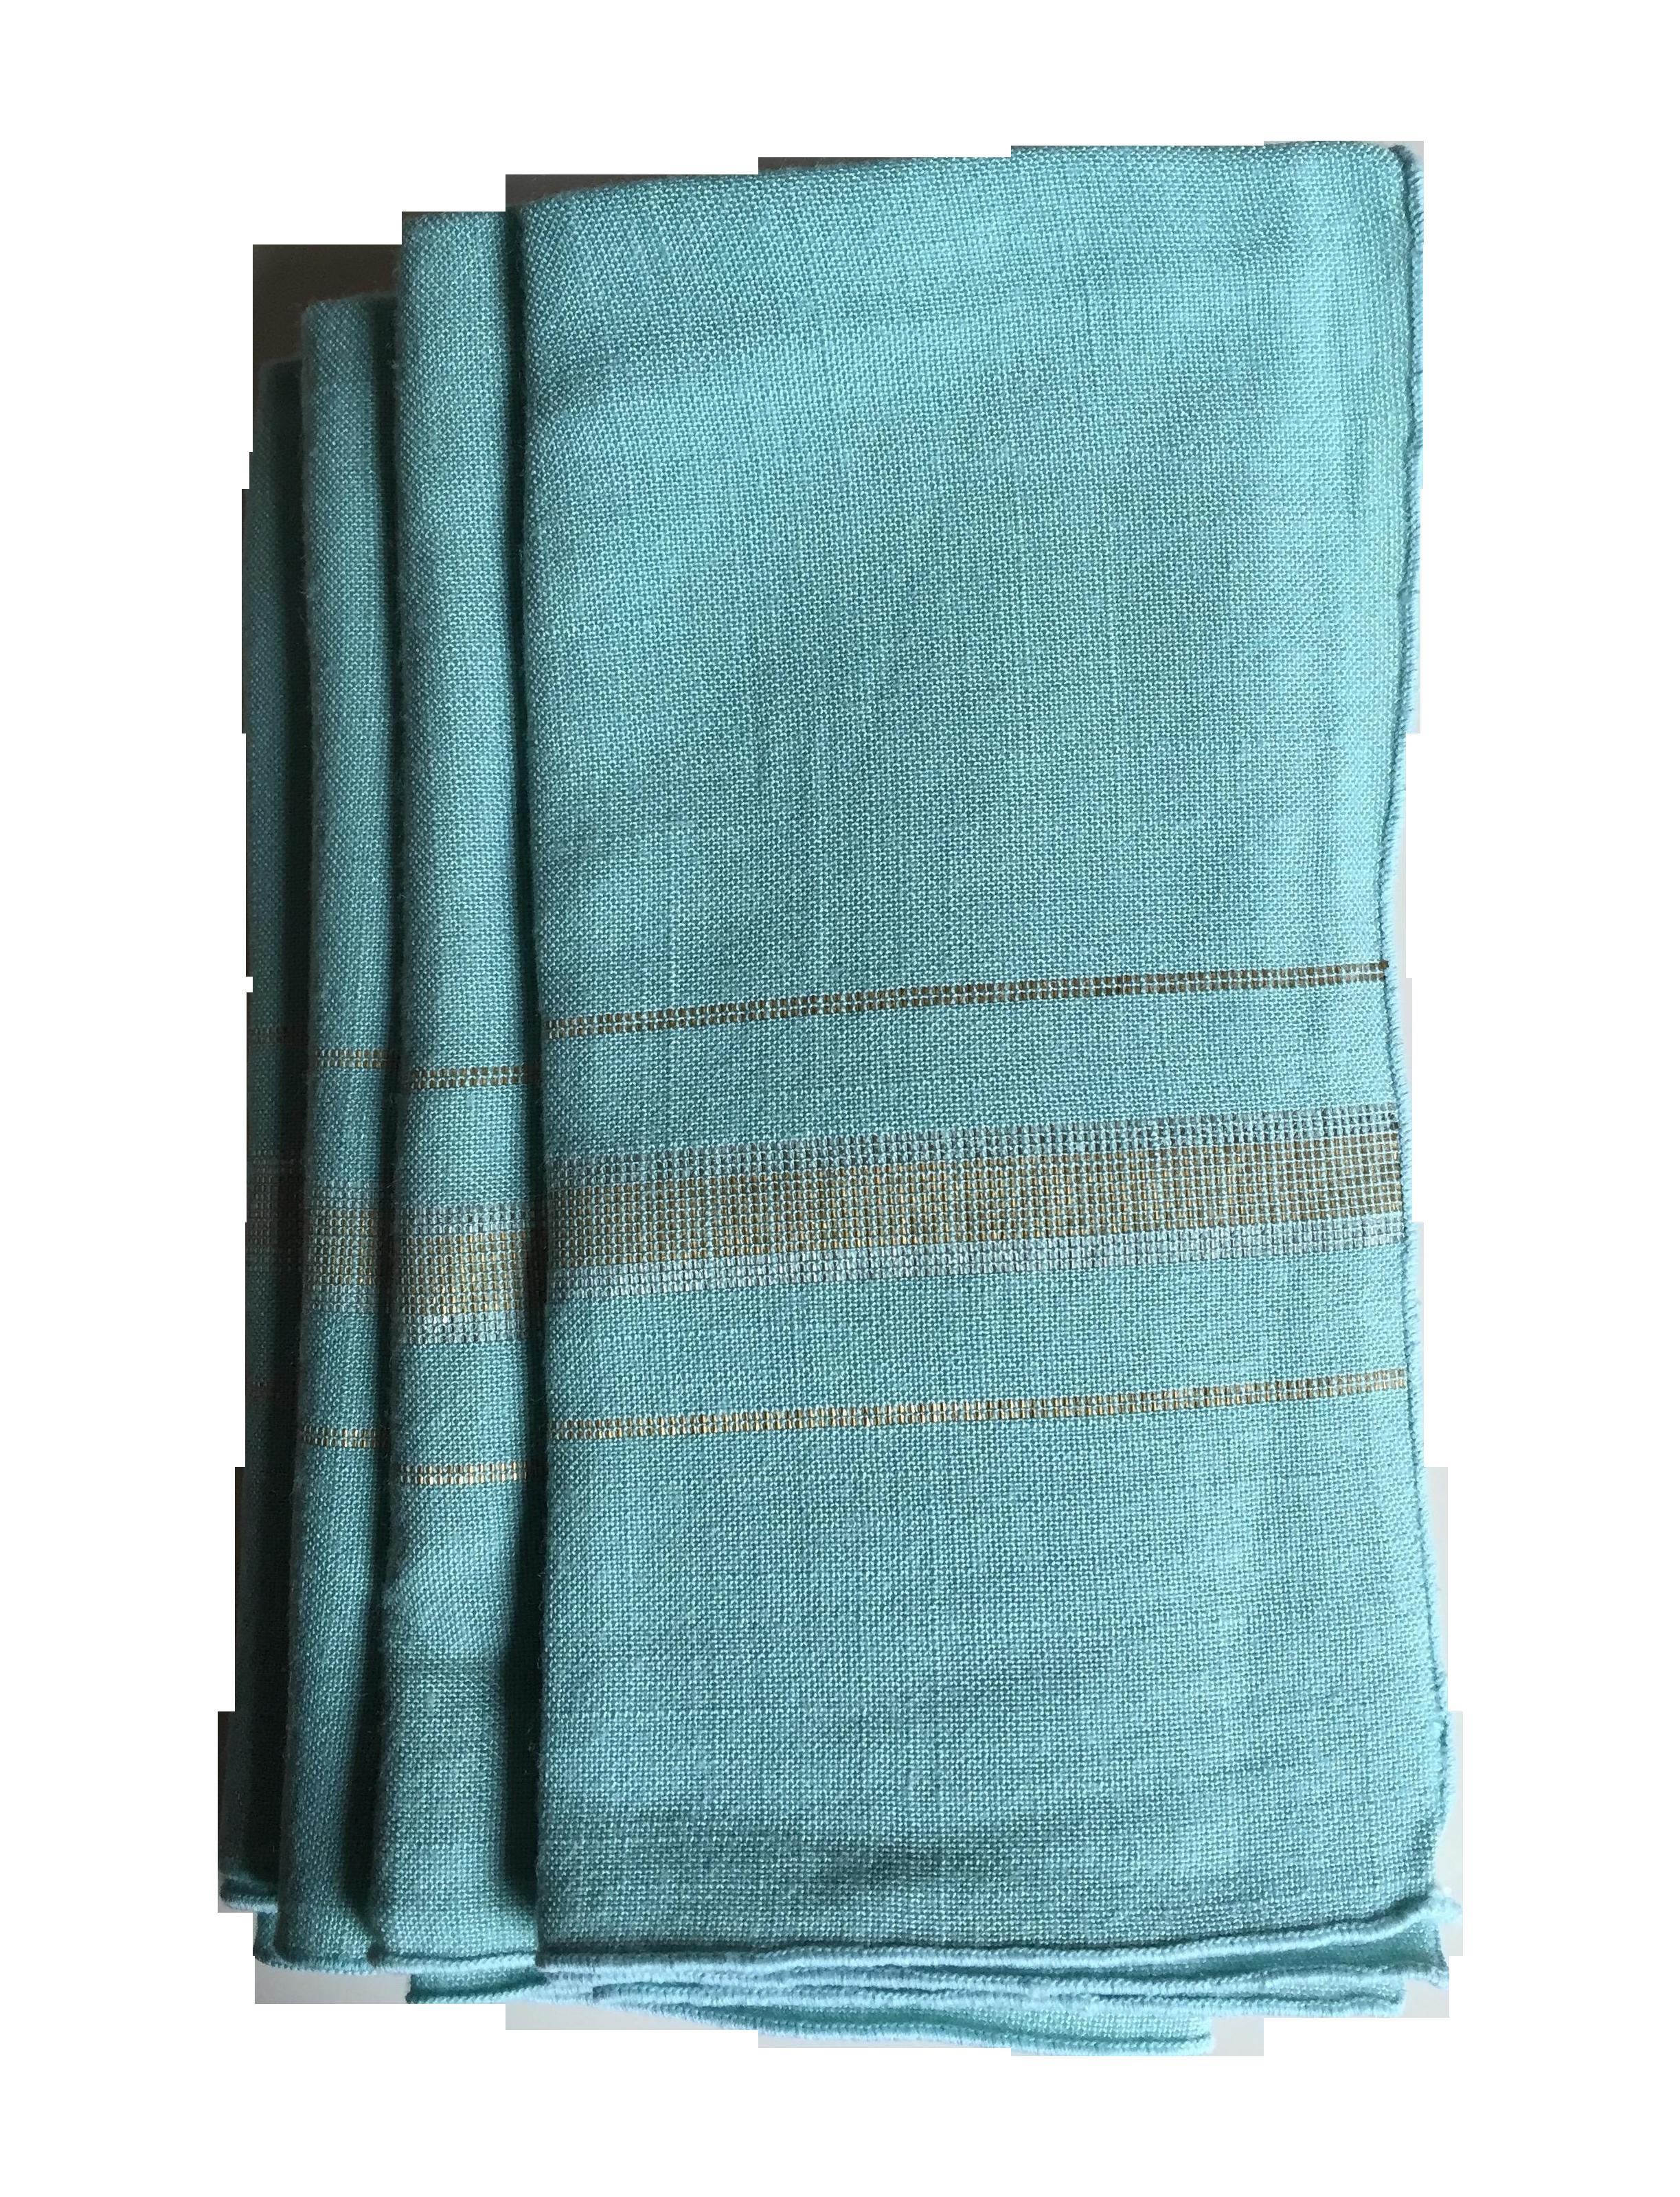 vintage-mint-green-and-metallic-napkins-set-of-4-2897.png